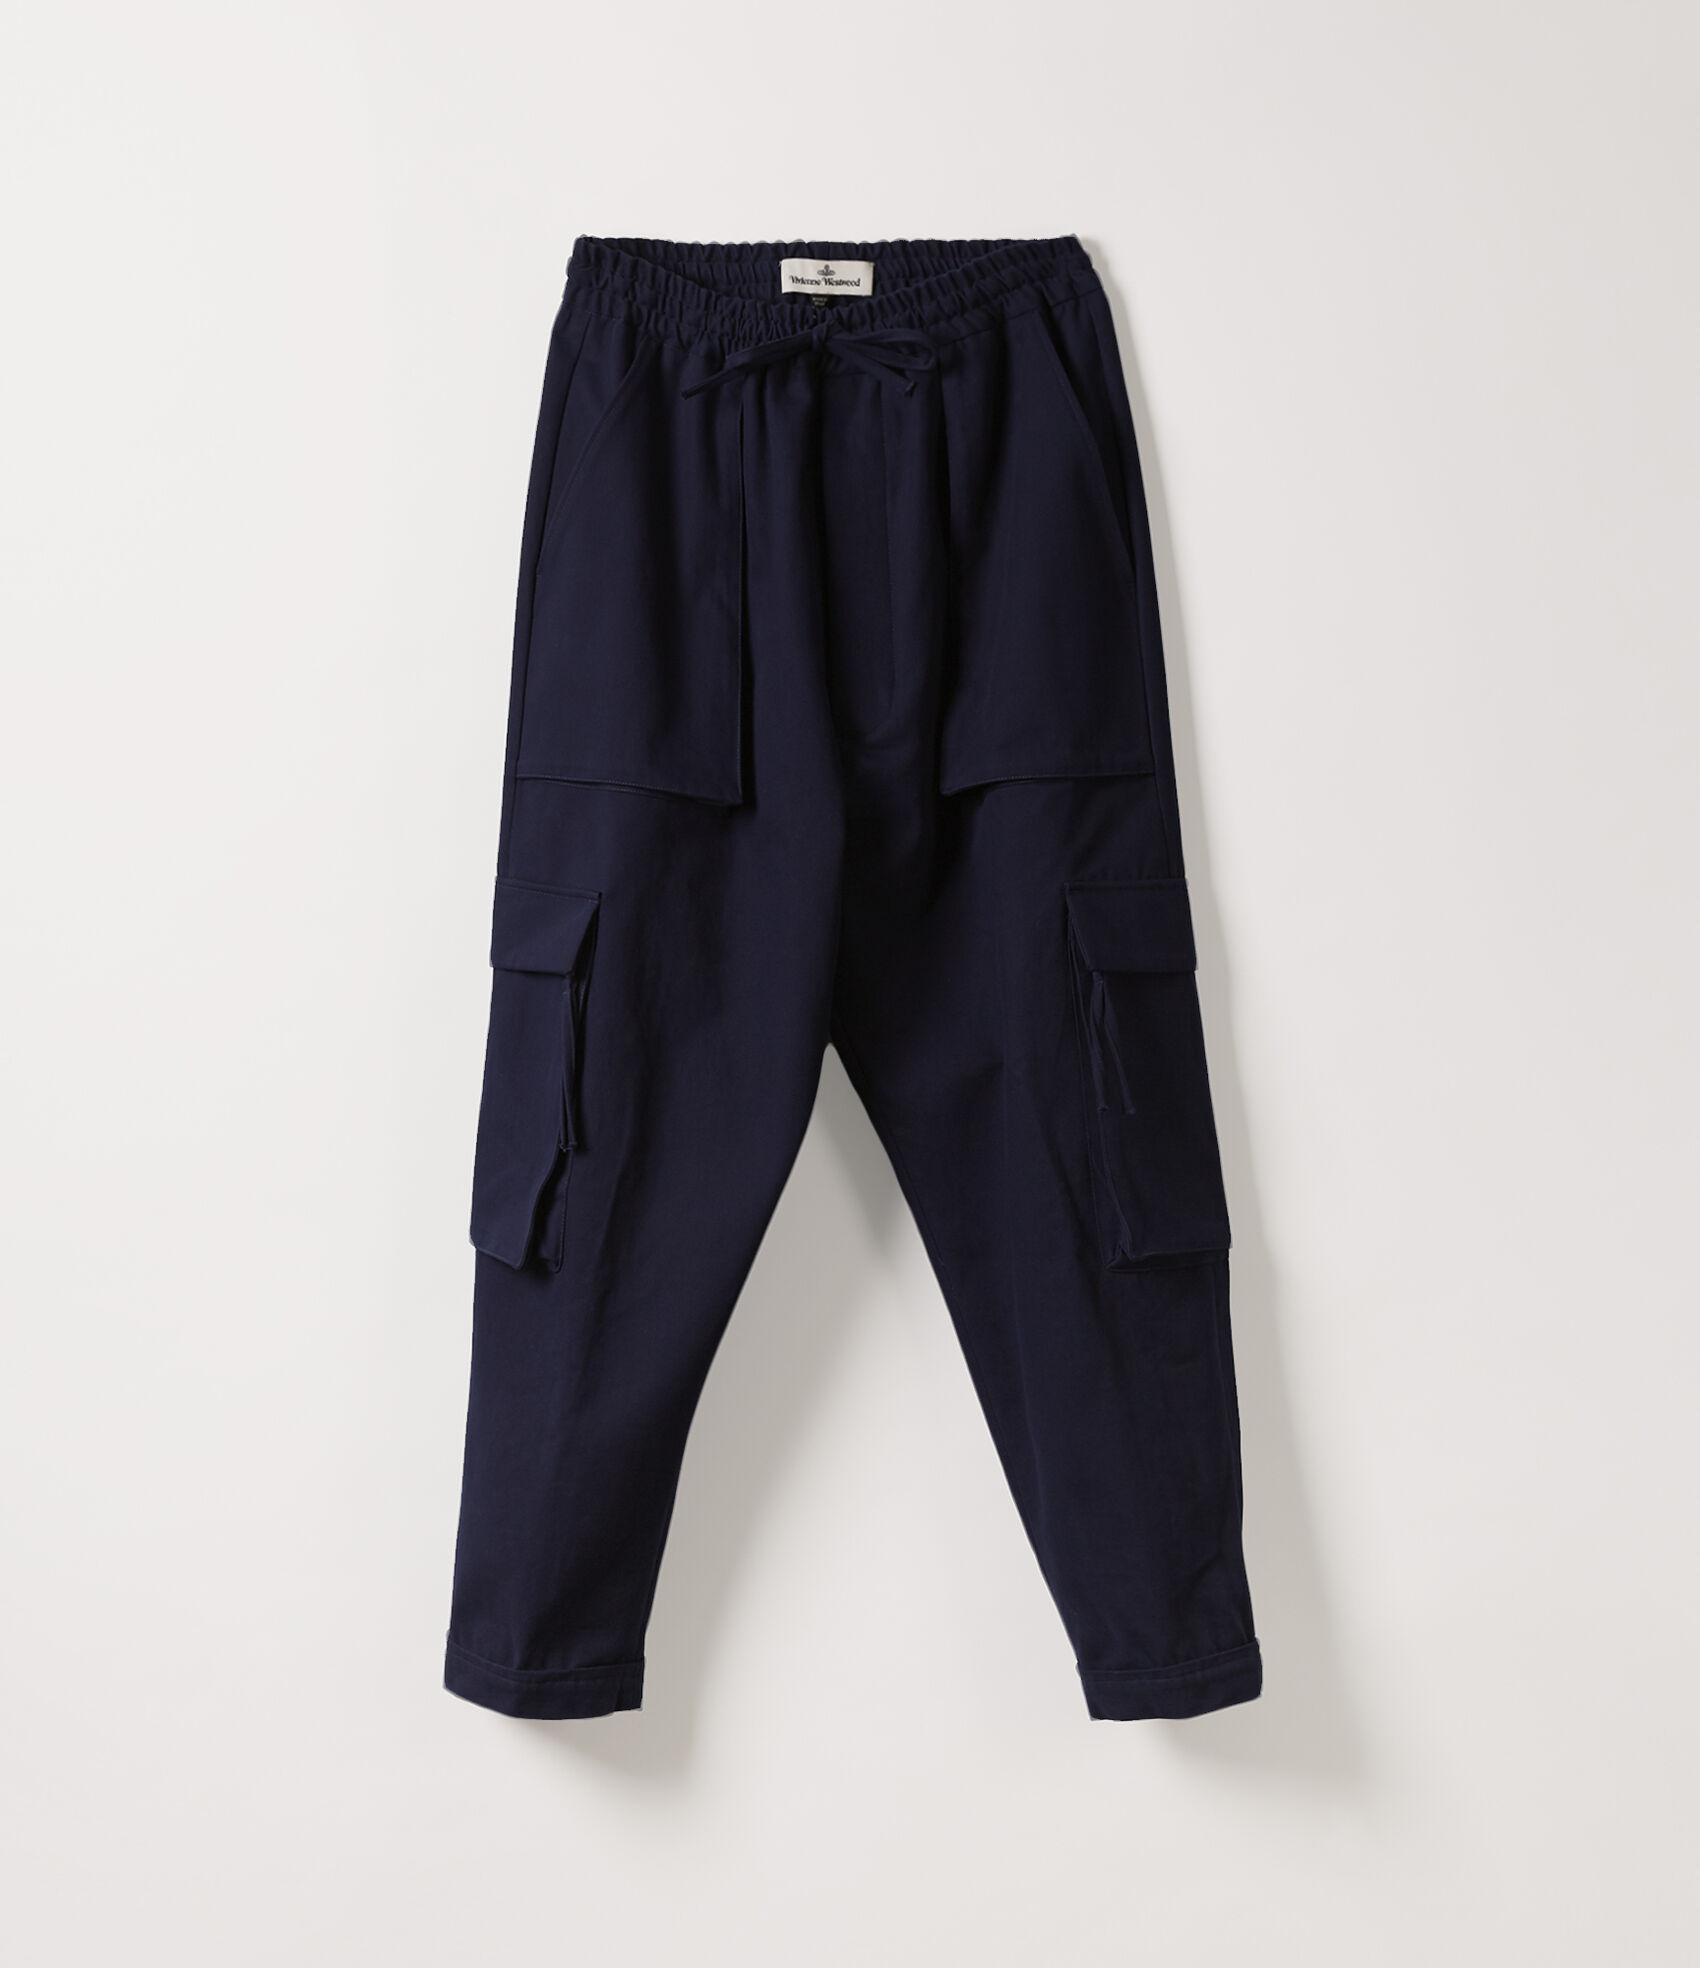 Vivienne Westwood Men's Designer Trousers Men | Vivienne Westwood - Django  Cargo Pants Navy